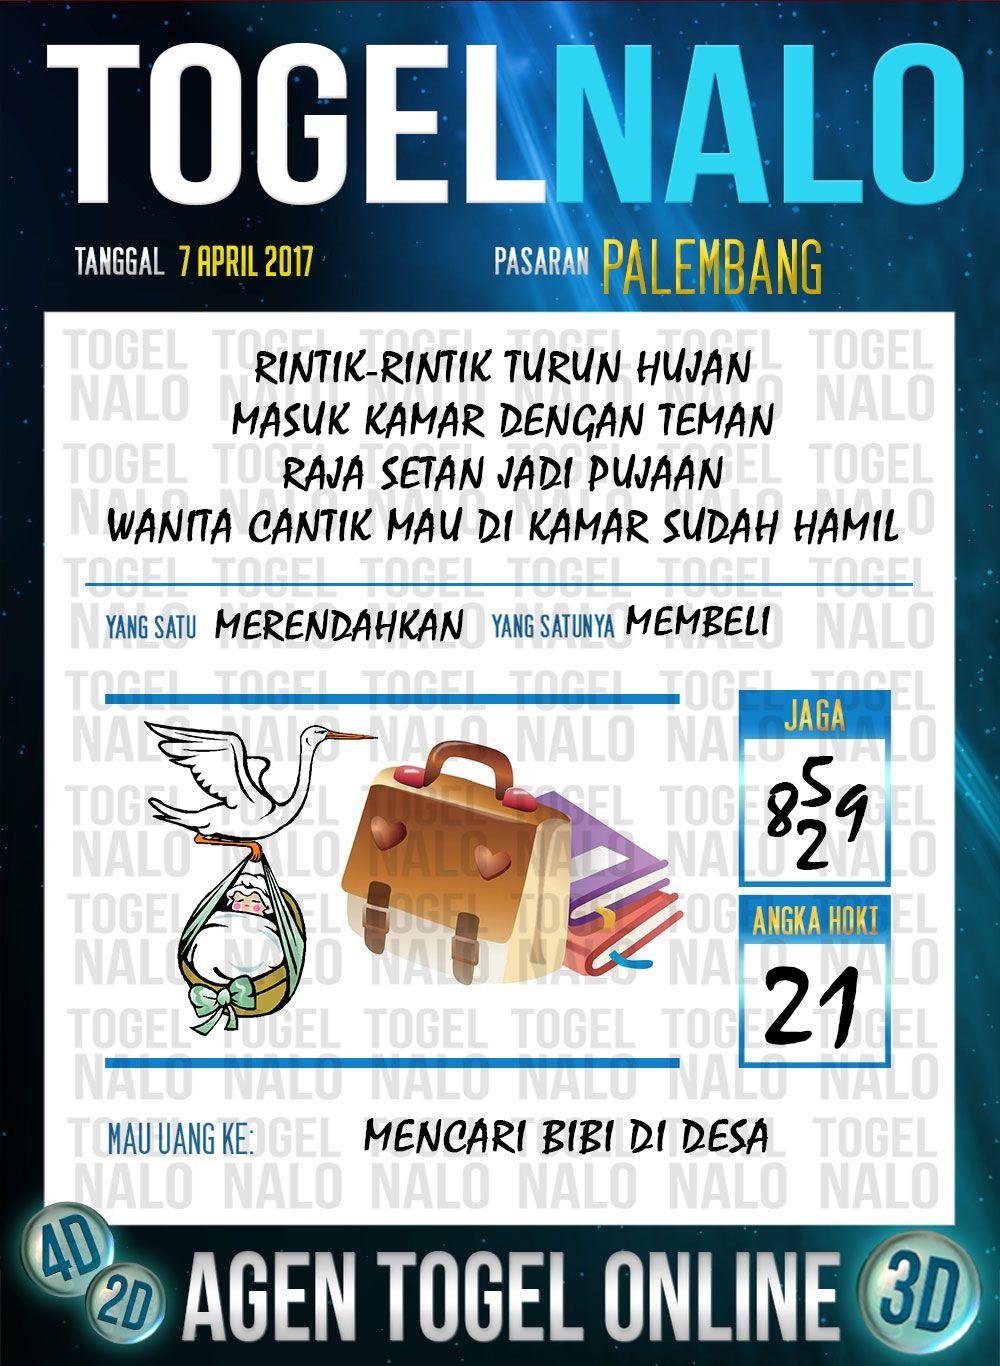 Angka Mimpi 5D Togel Wap Online TogelNalo Palembang 7 April 2017